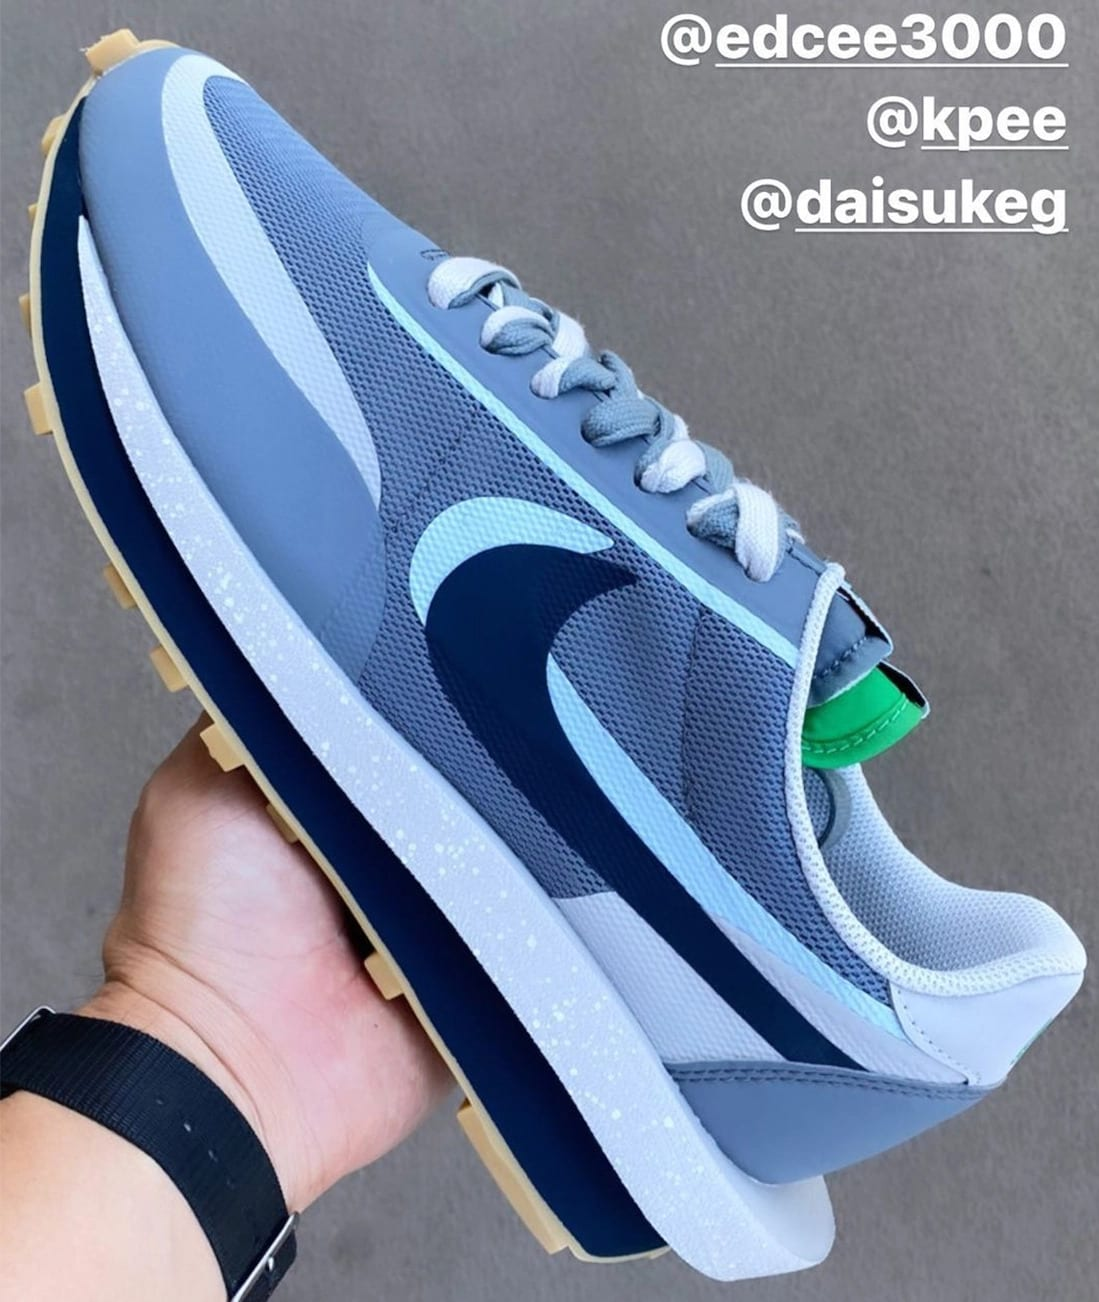 Clot x Sacai x Nike LDWaffle Grey Kiss of Death 2 Release Date Side